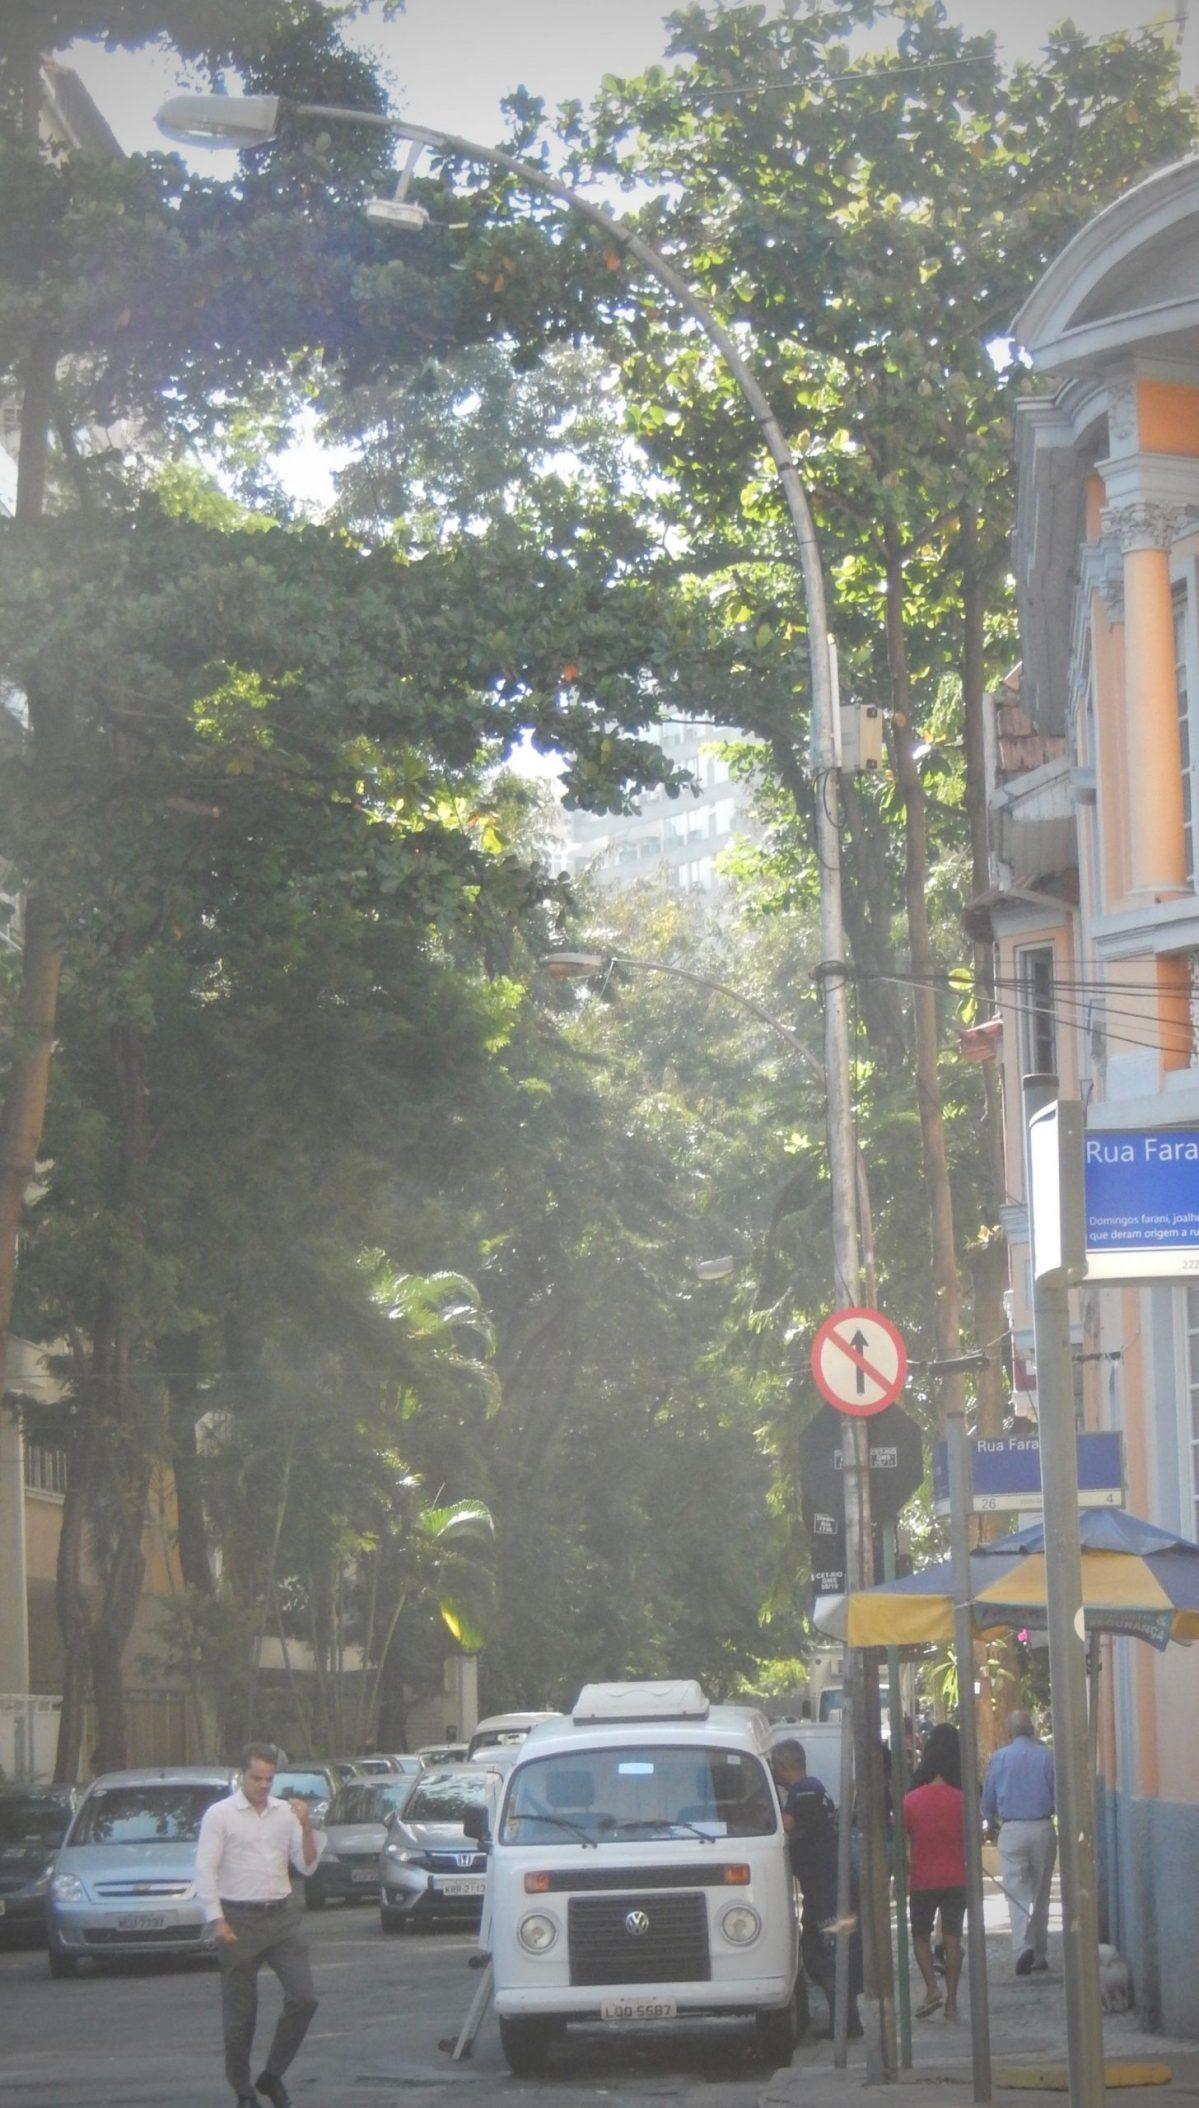 Hippy Van - 40 Facts on Brazil